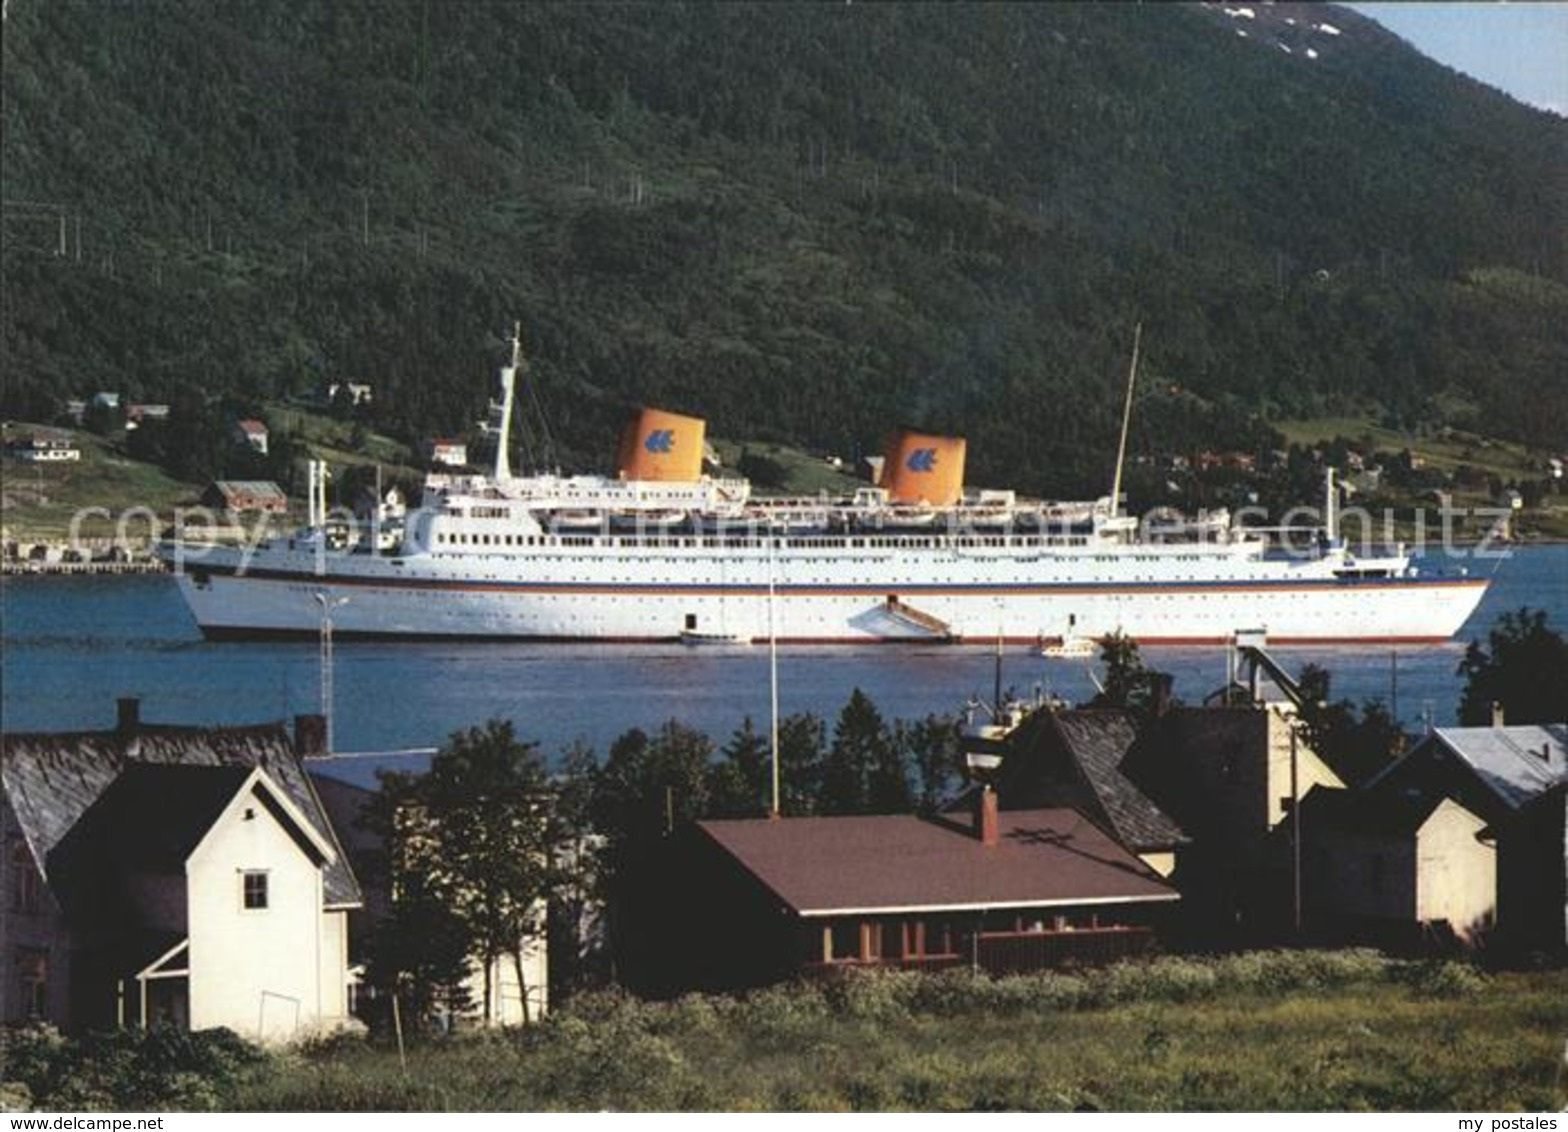 71965547 Schiffe Ships Navires MS Europa 21514 BRT/GRT Hapag-Lloyd Schiffe Ships - Schiffe